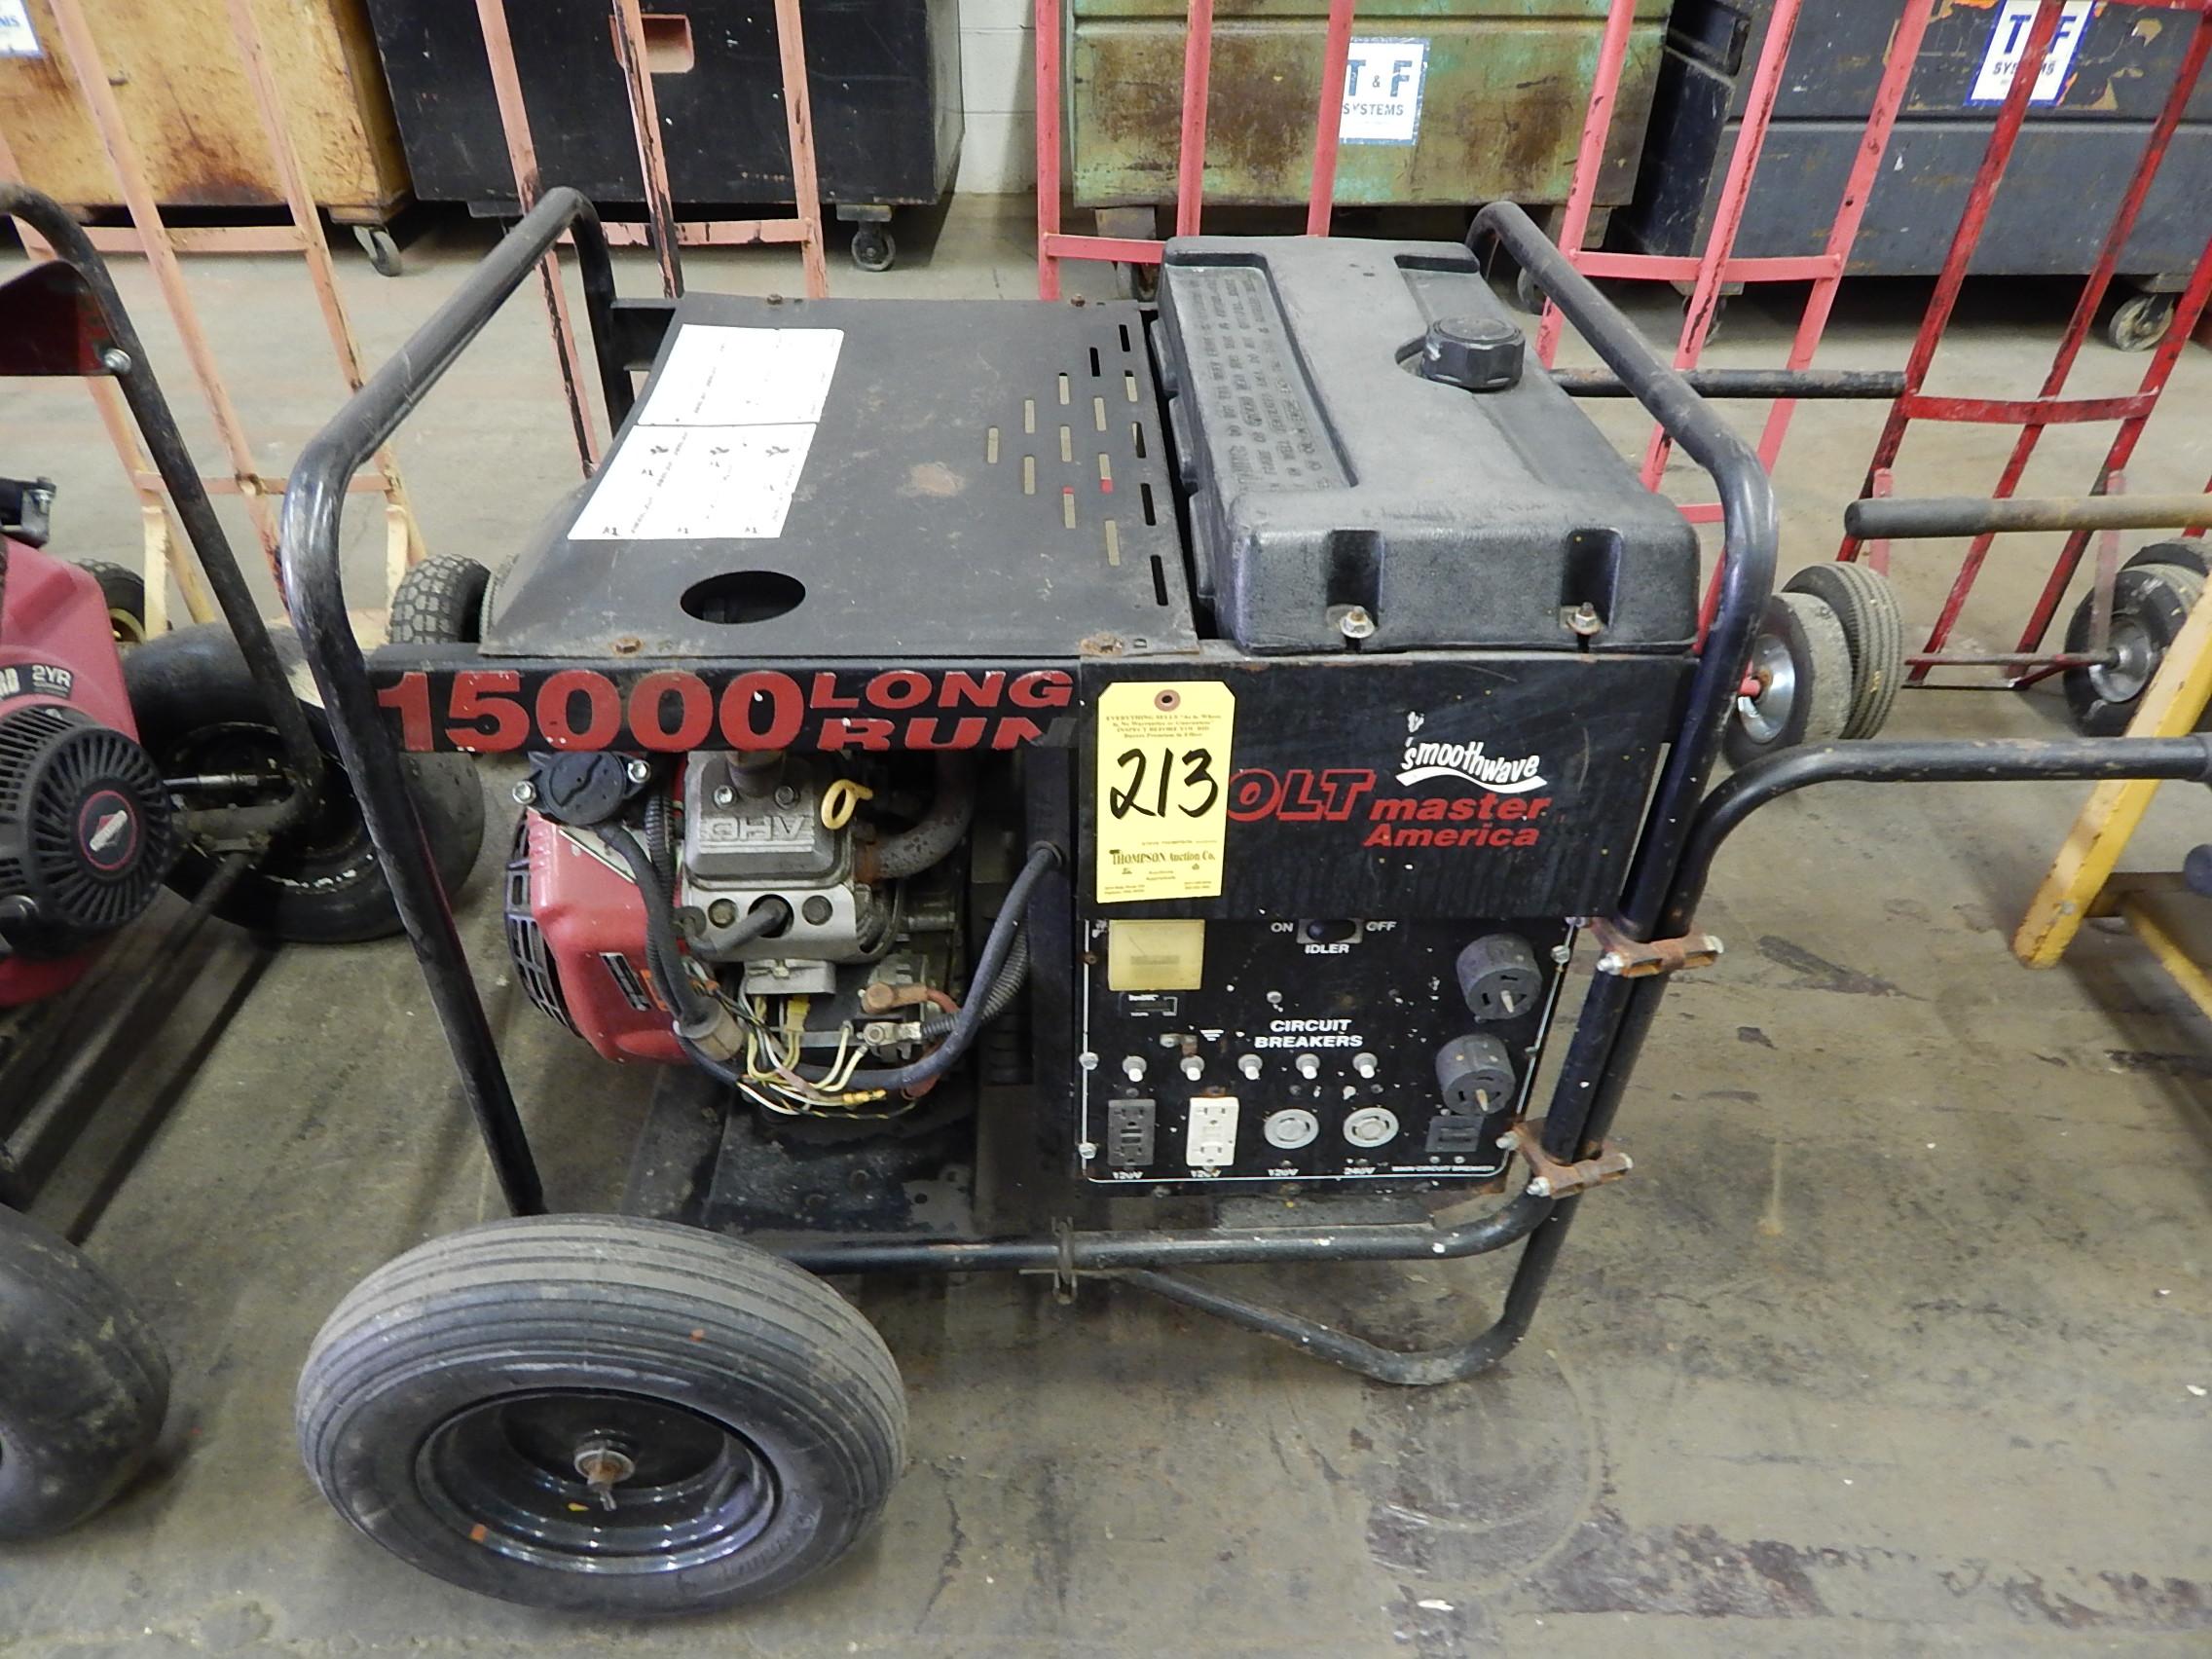 Lot 213 Volt Master America Model 15000 Long Run Gas Ed Generator Electric